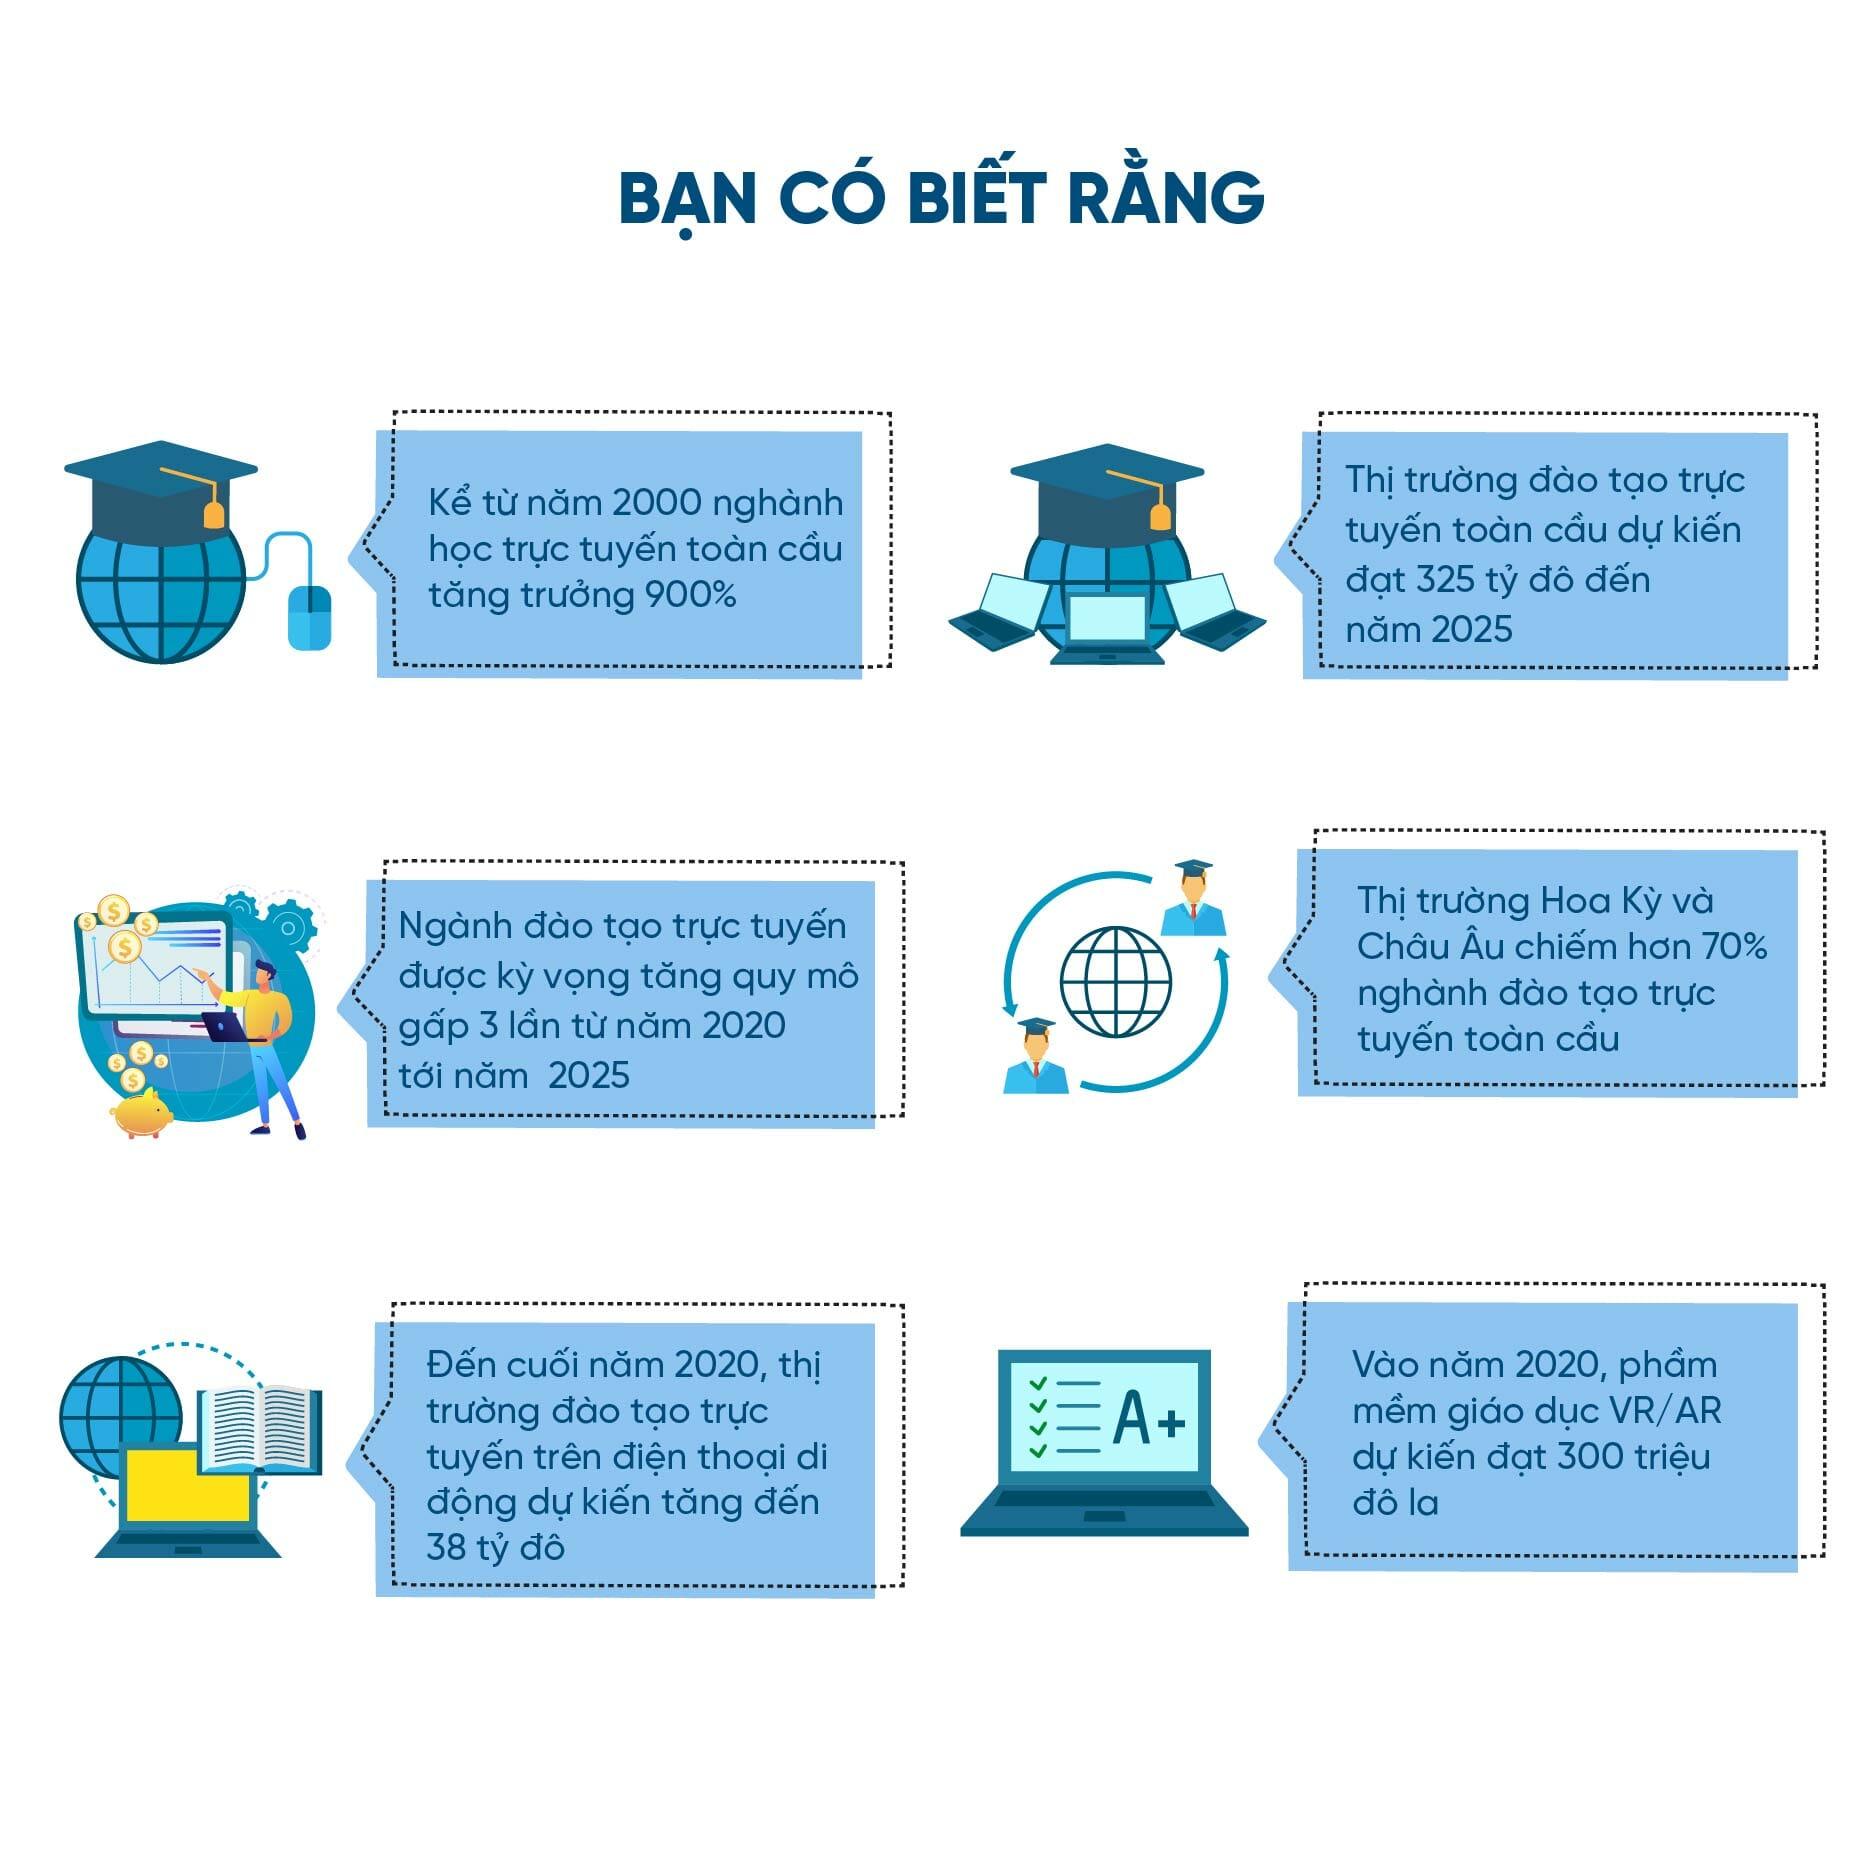 VietED-nganh-dao-tao-truc-tuyen-toan-cau-nam-2020